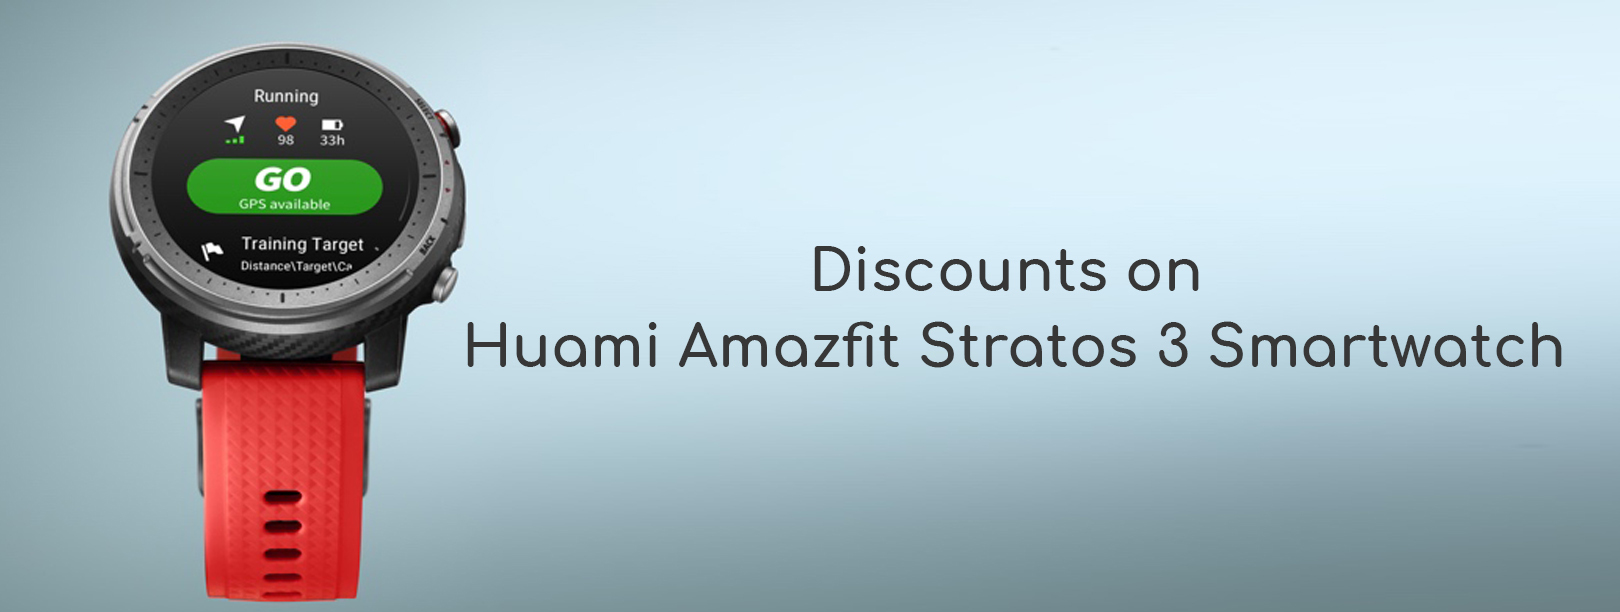 Flipkart Huami Amazfit Stratos 3 Smartwatch